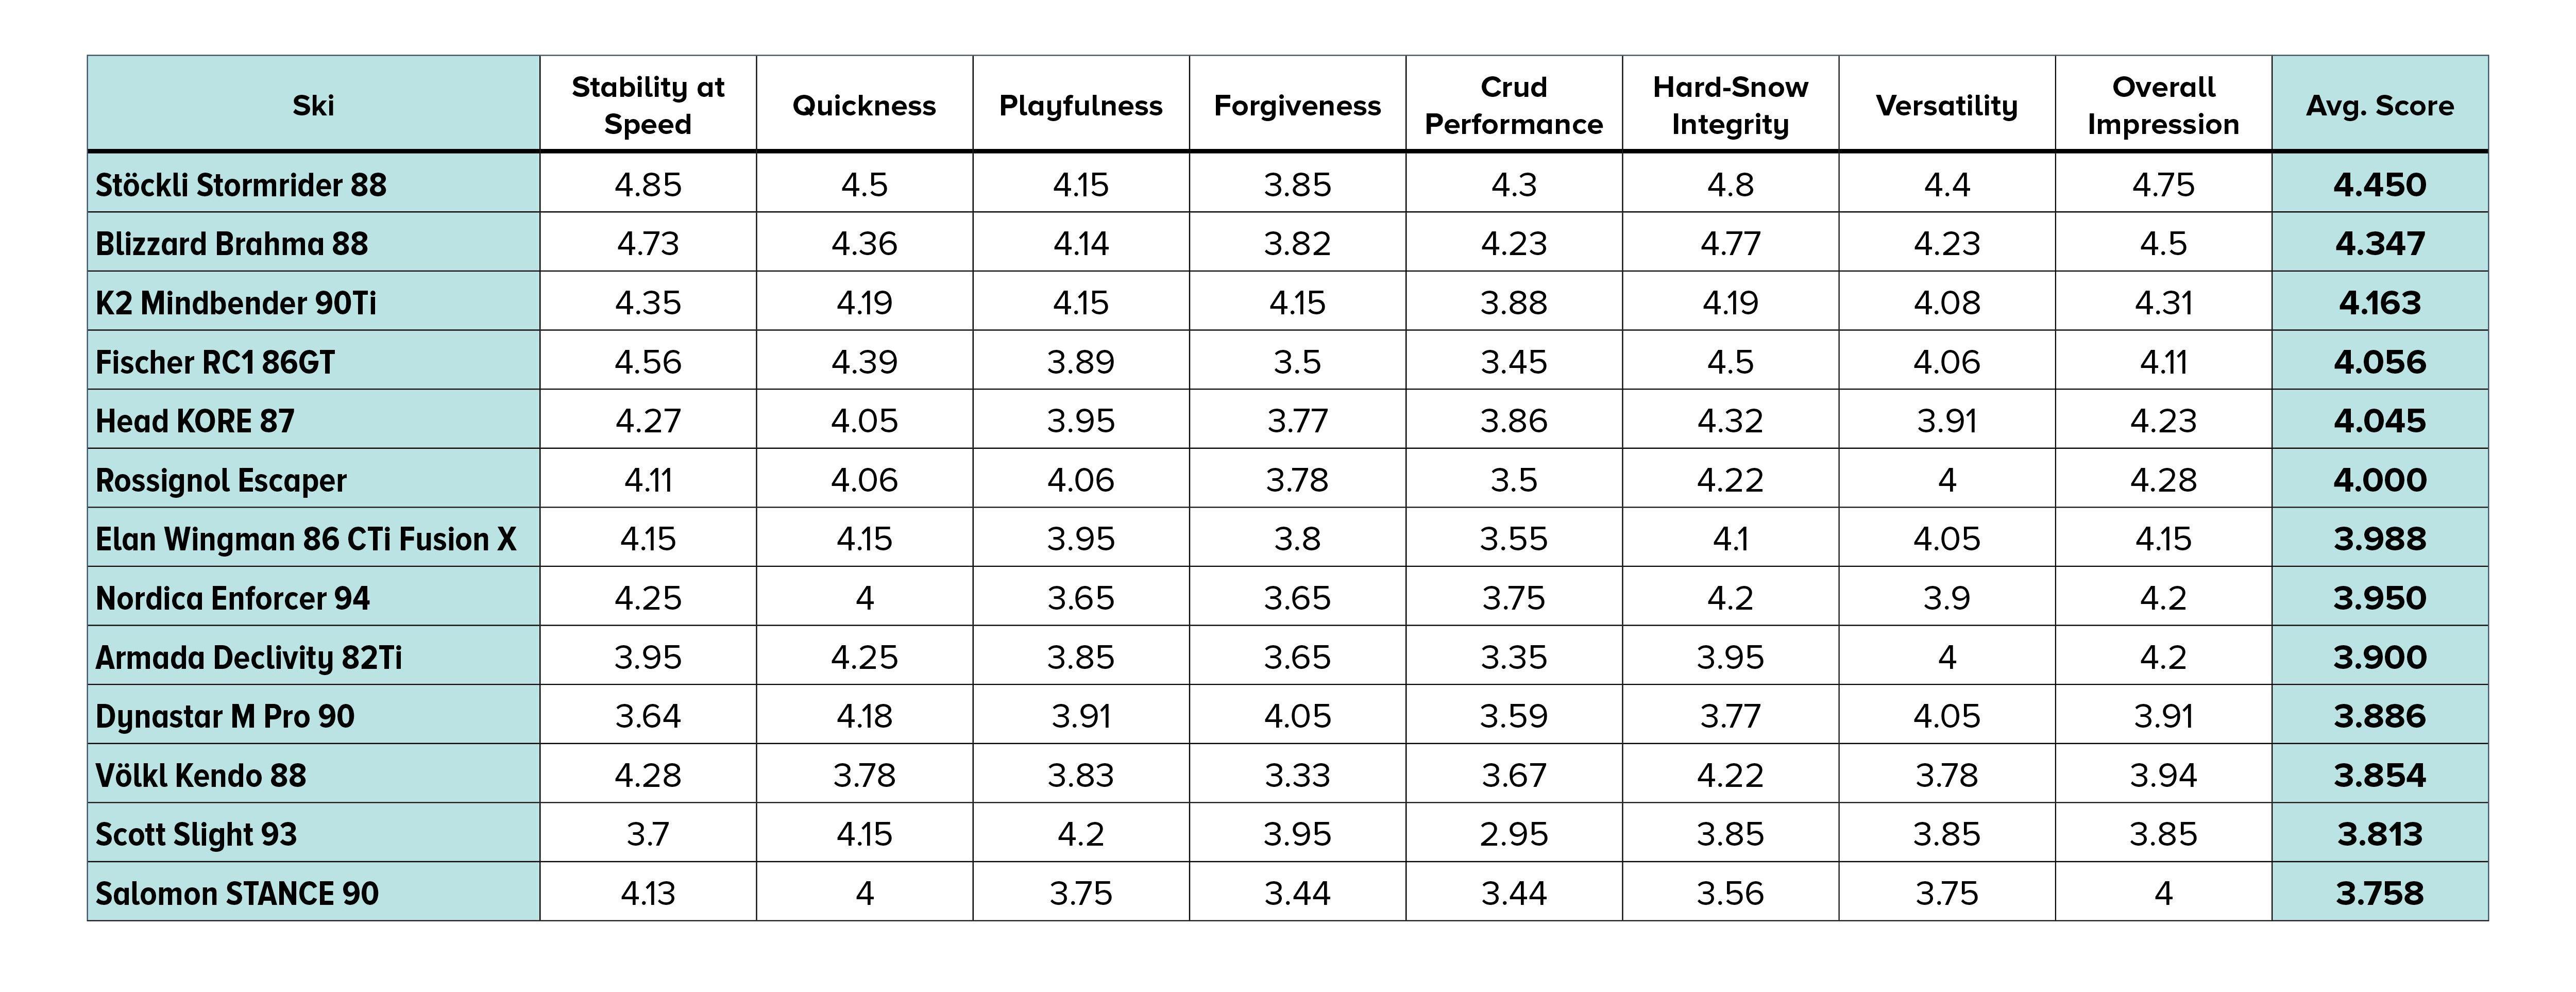 2021 SKI Test Scores for Mens Frontside skis